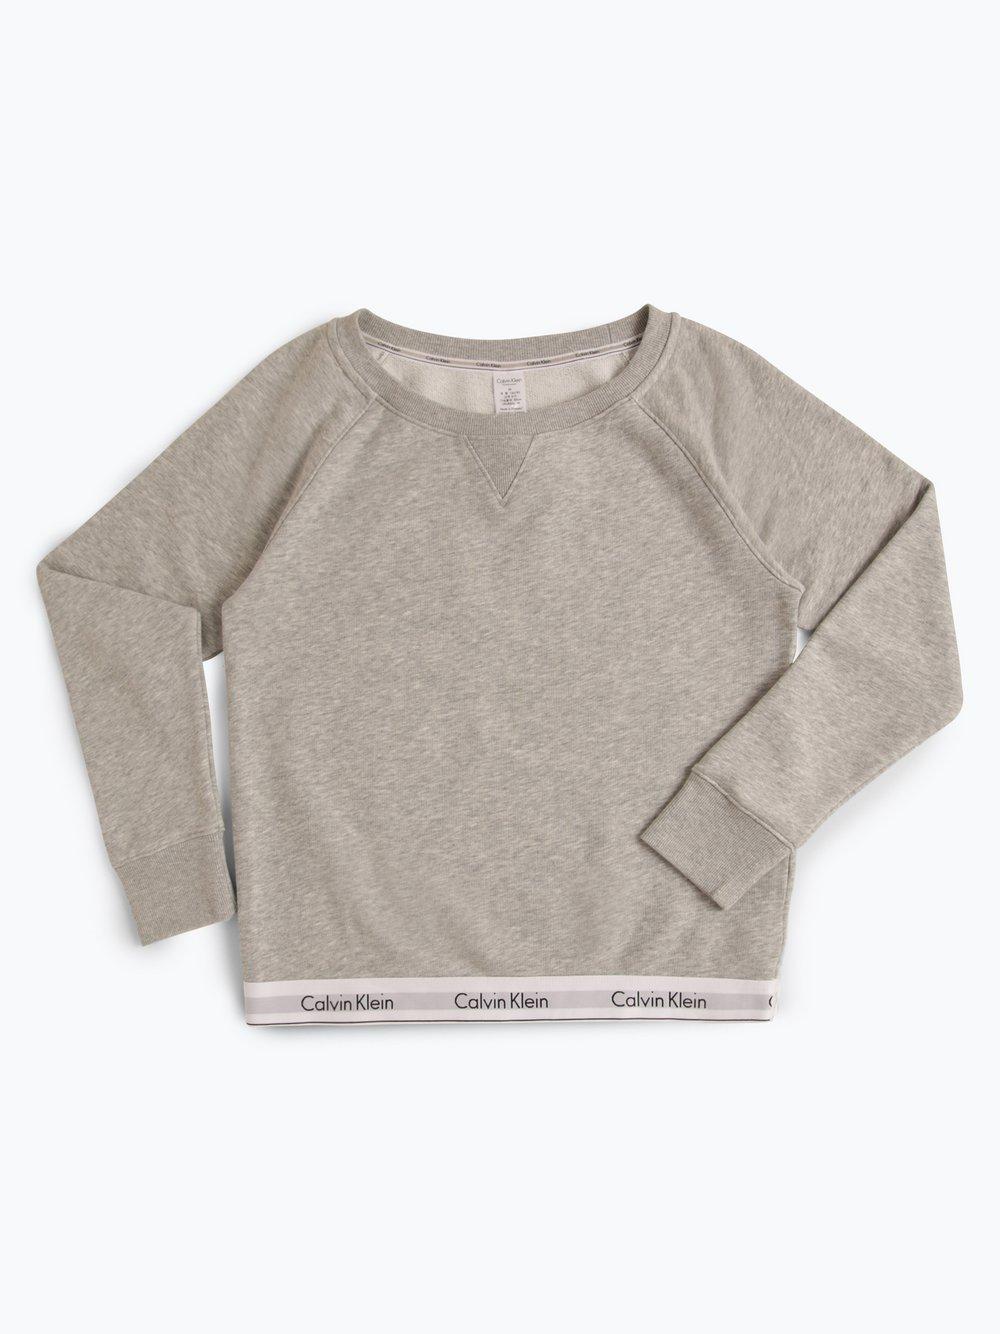 Calvin Klein - Damska bluza nierozpinana, szary